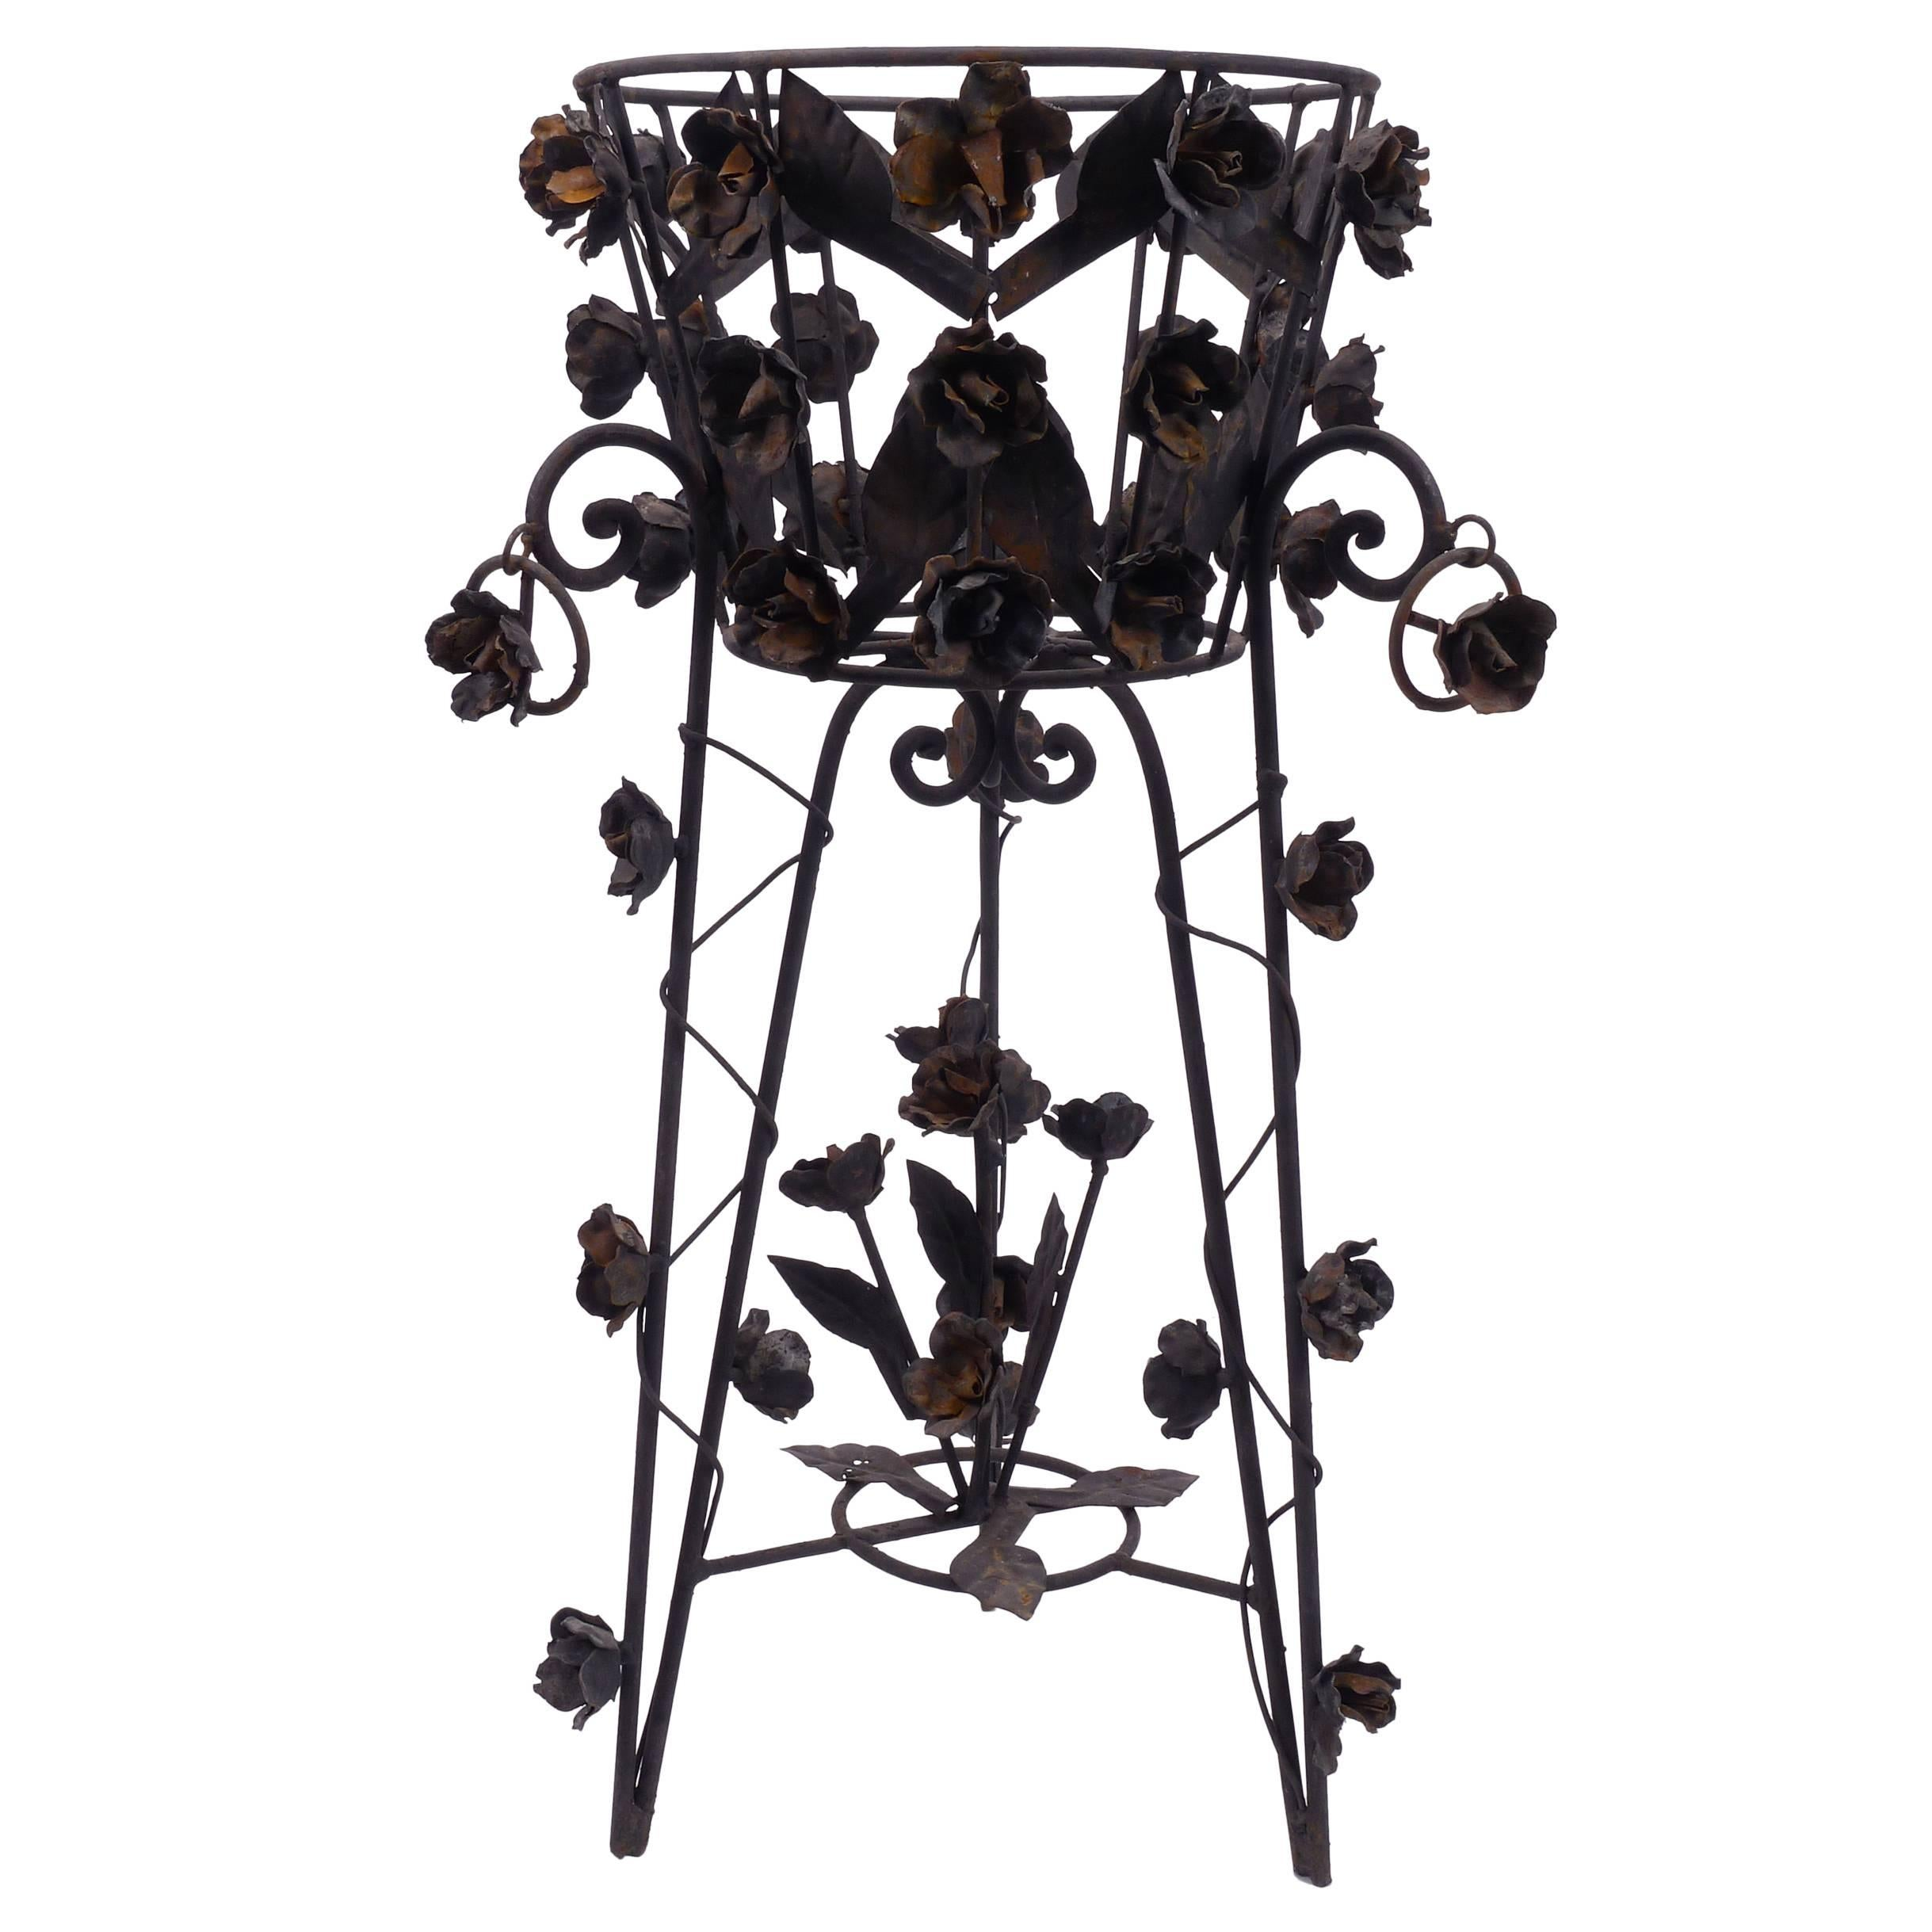 hollywood regency furniture 6 684 for sale at 1stdibs page 32